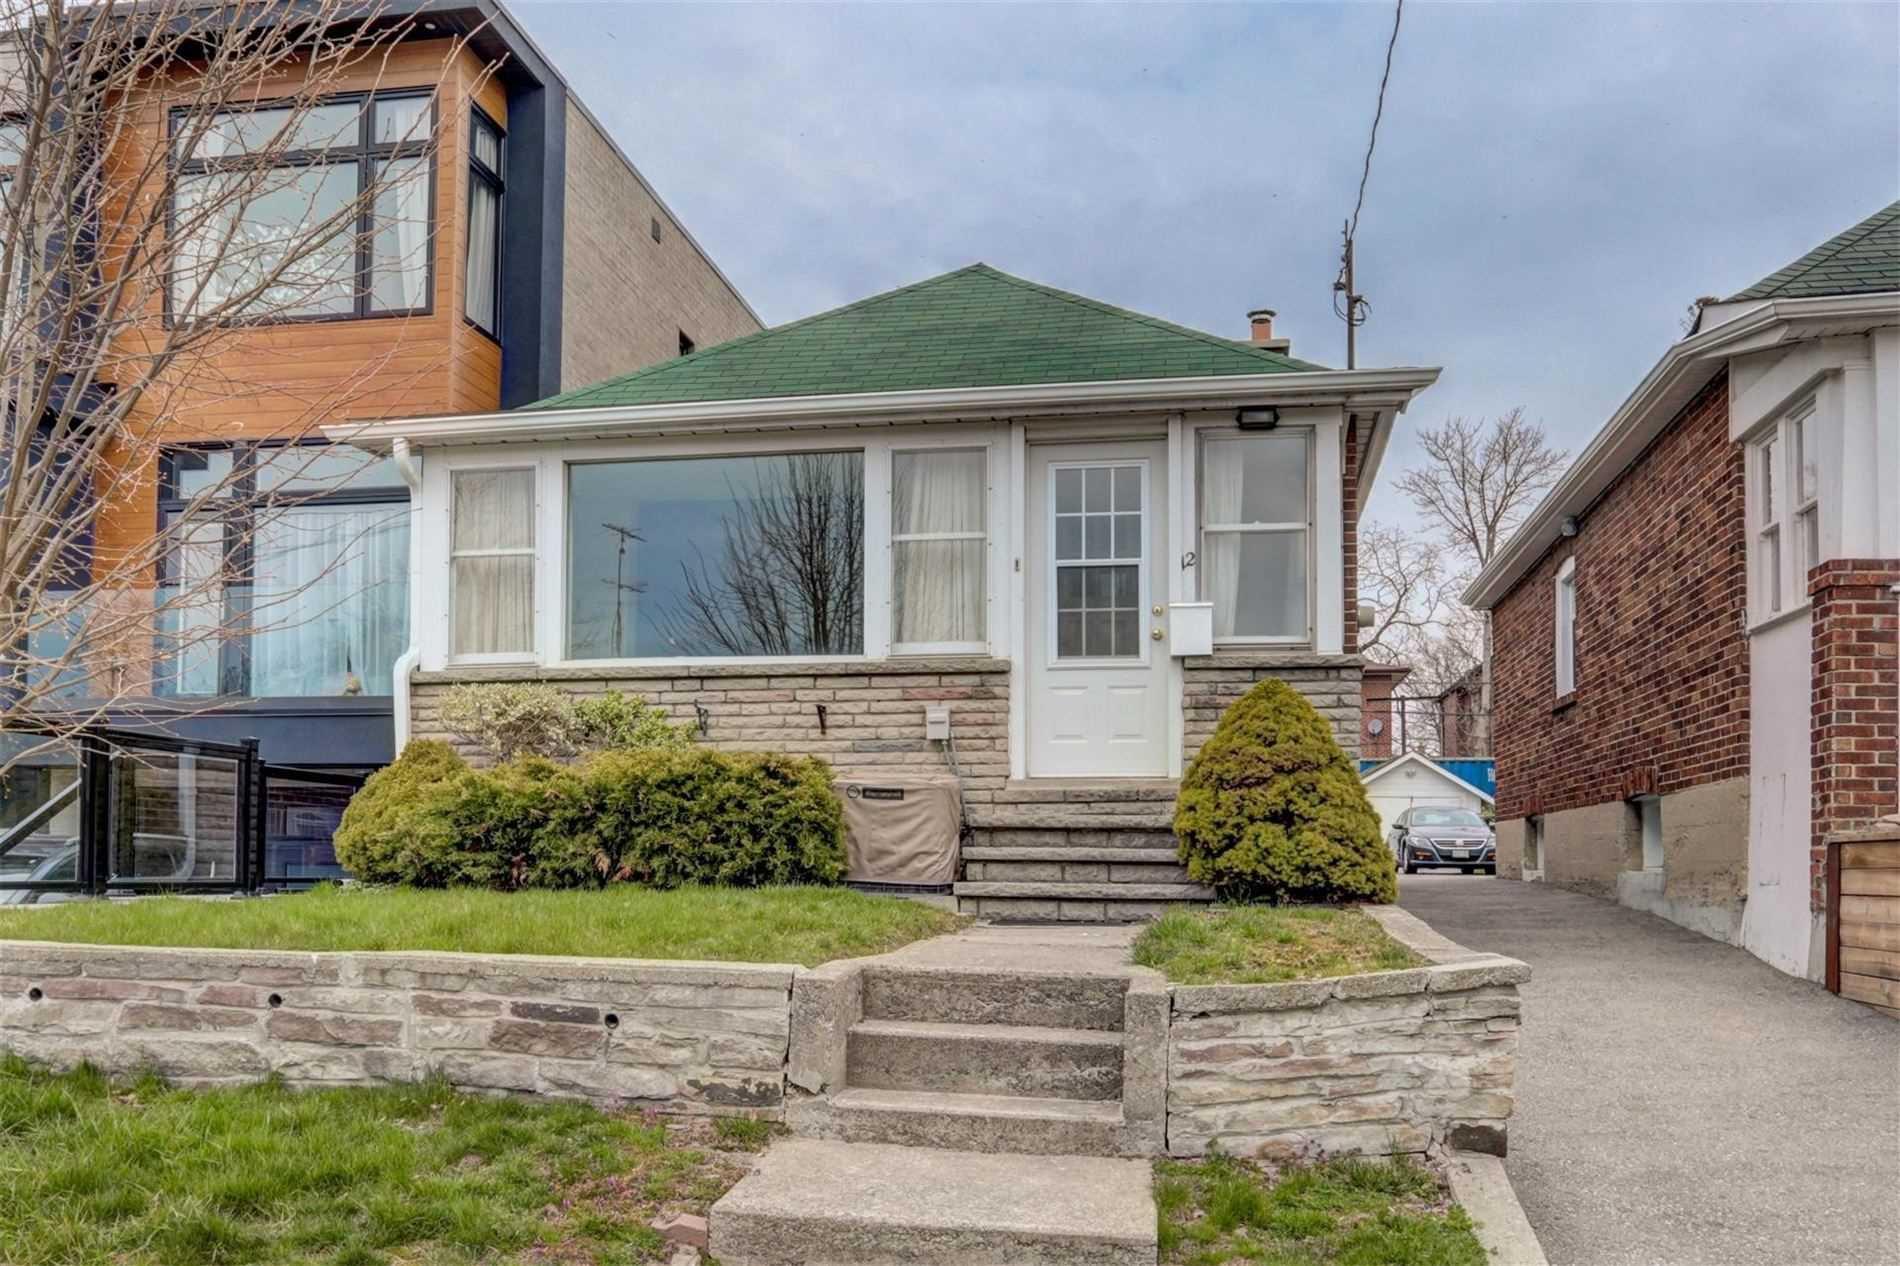 Main Photo: 12 Villa Road in Toronto: Long Branch House (Bungalow) for sale (Toronto W06)  : MLS®# W4749750